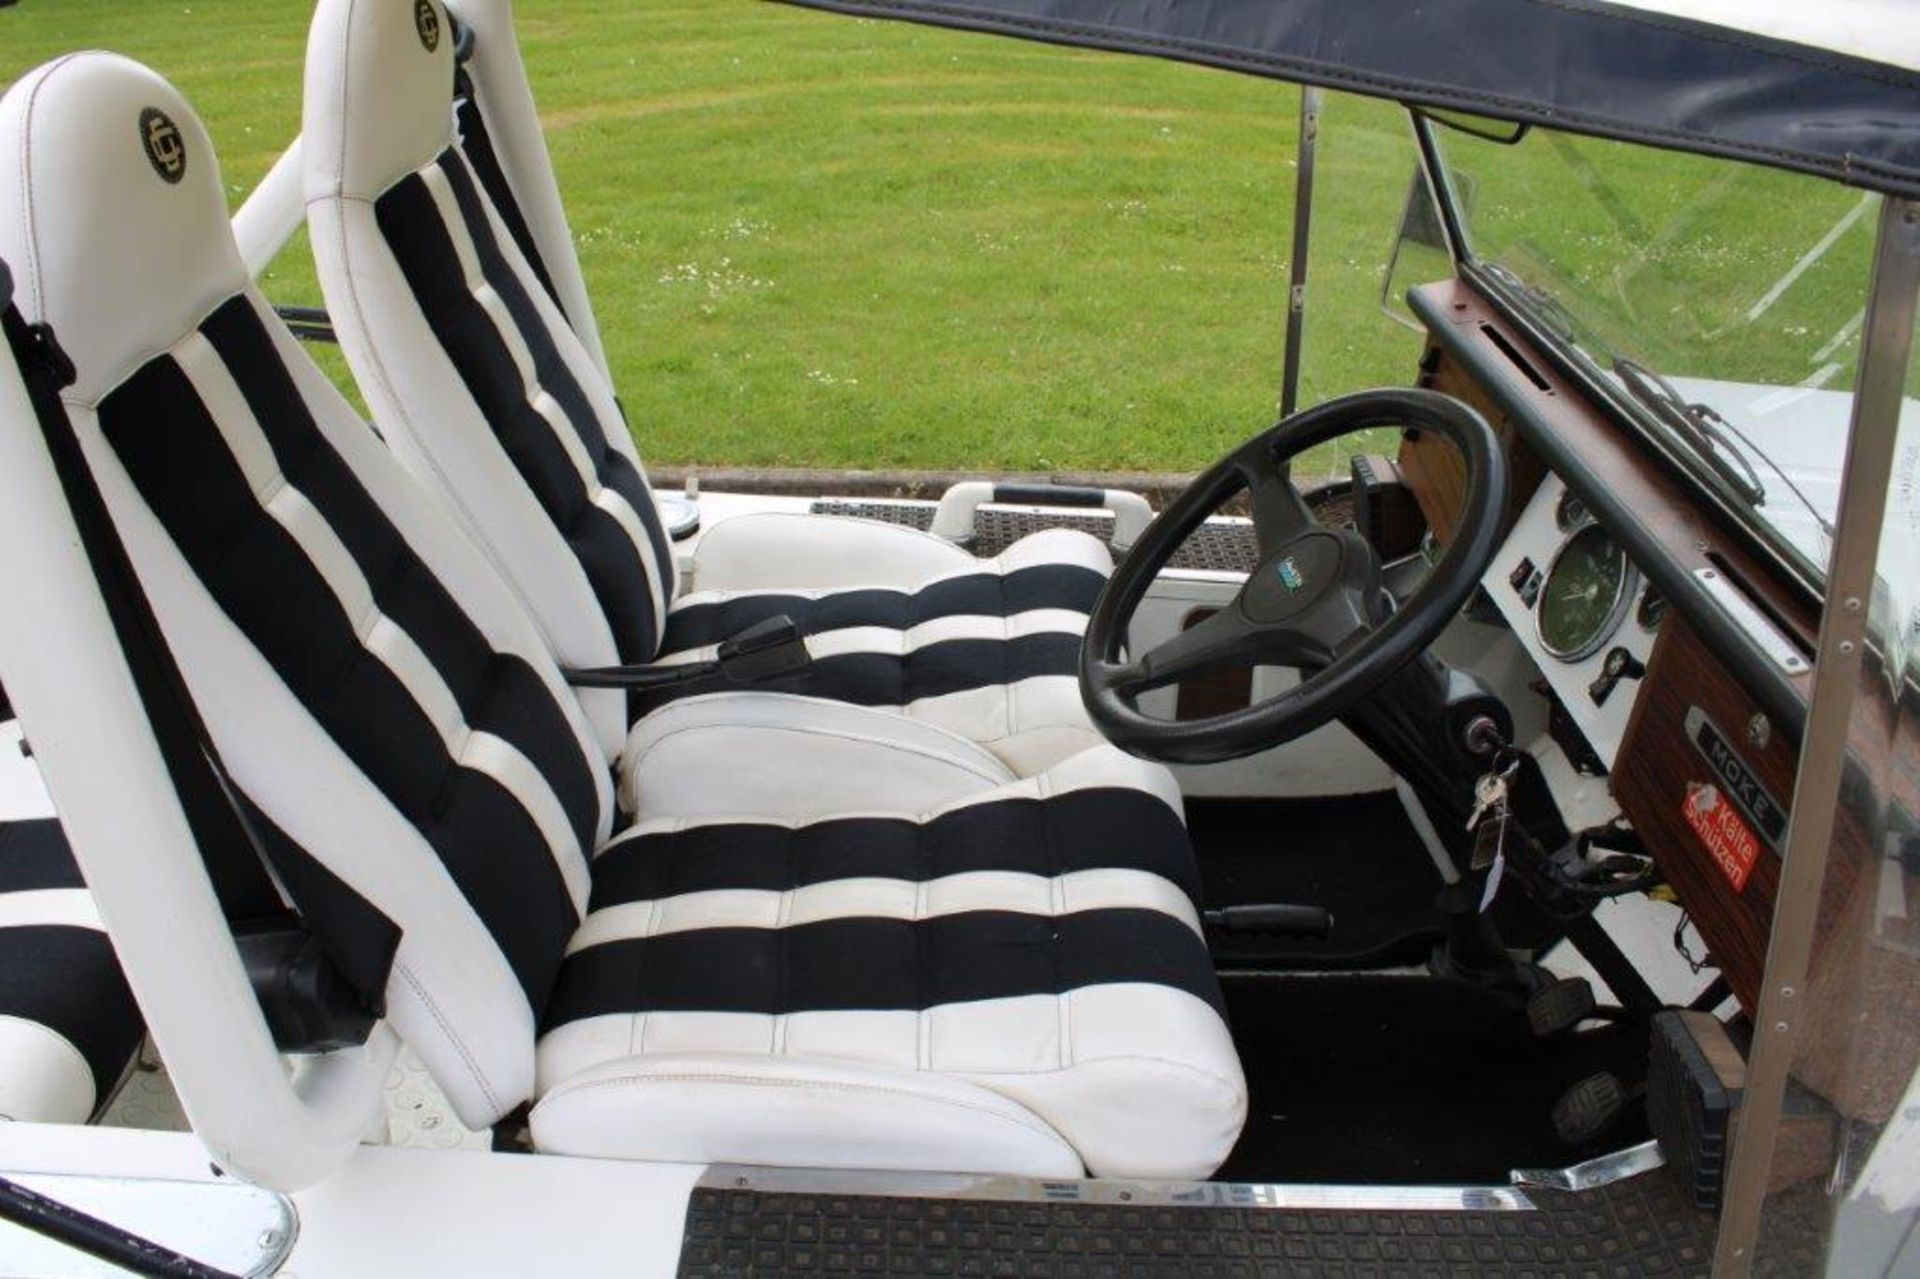 1988 Austin Rover Mini Moke - Image 17 of 22